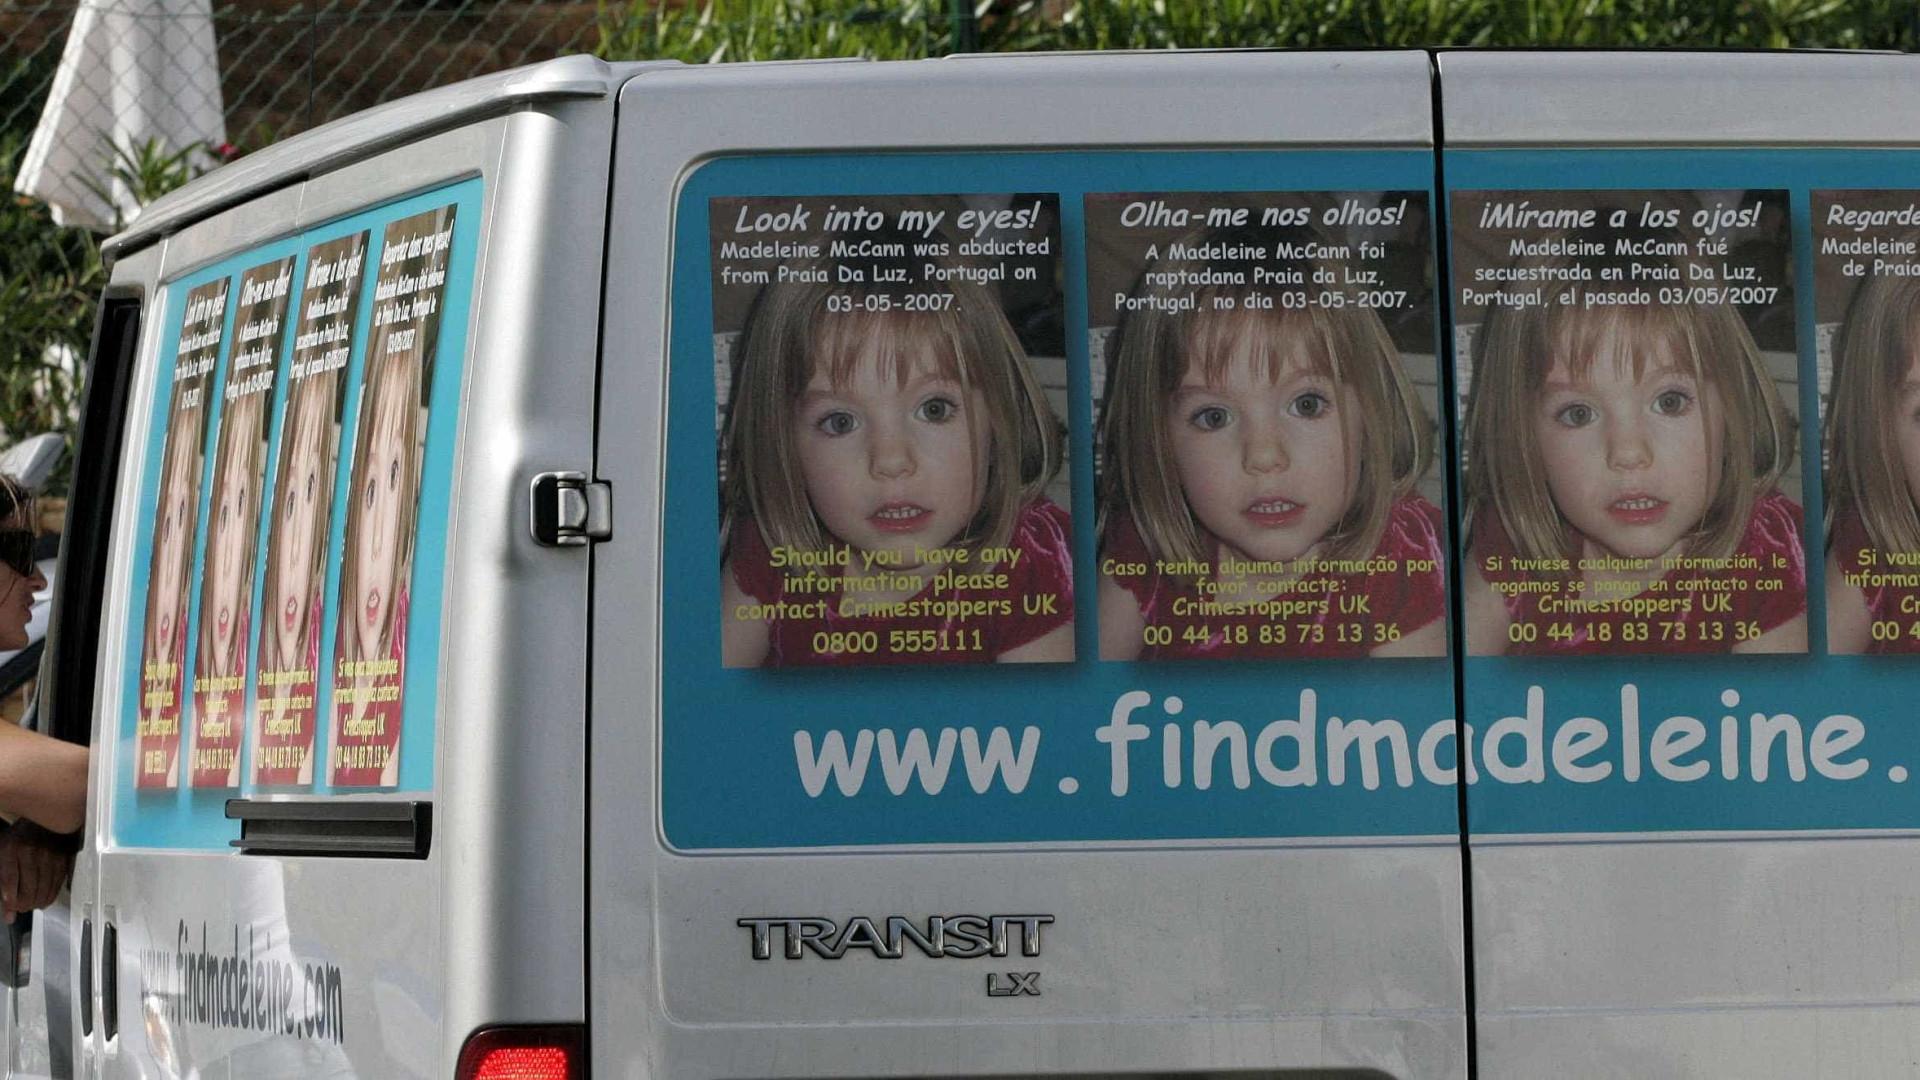 Caso Maddie. Polícia britânica desvalorizou suspeito alemão em 2012